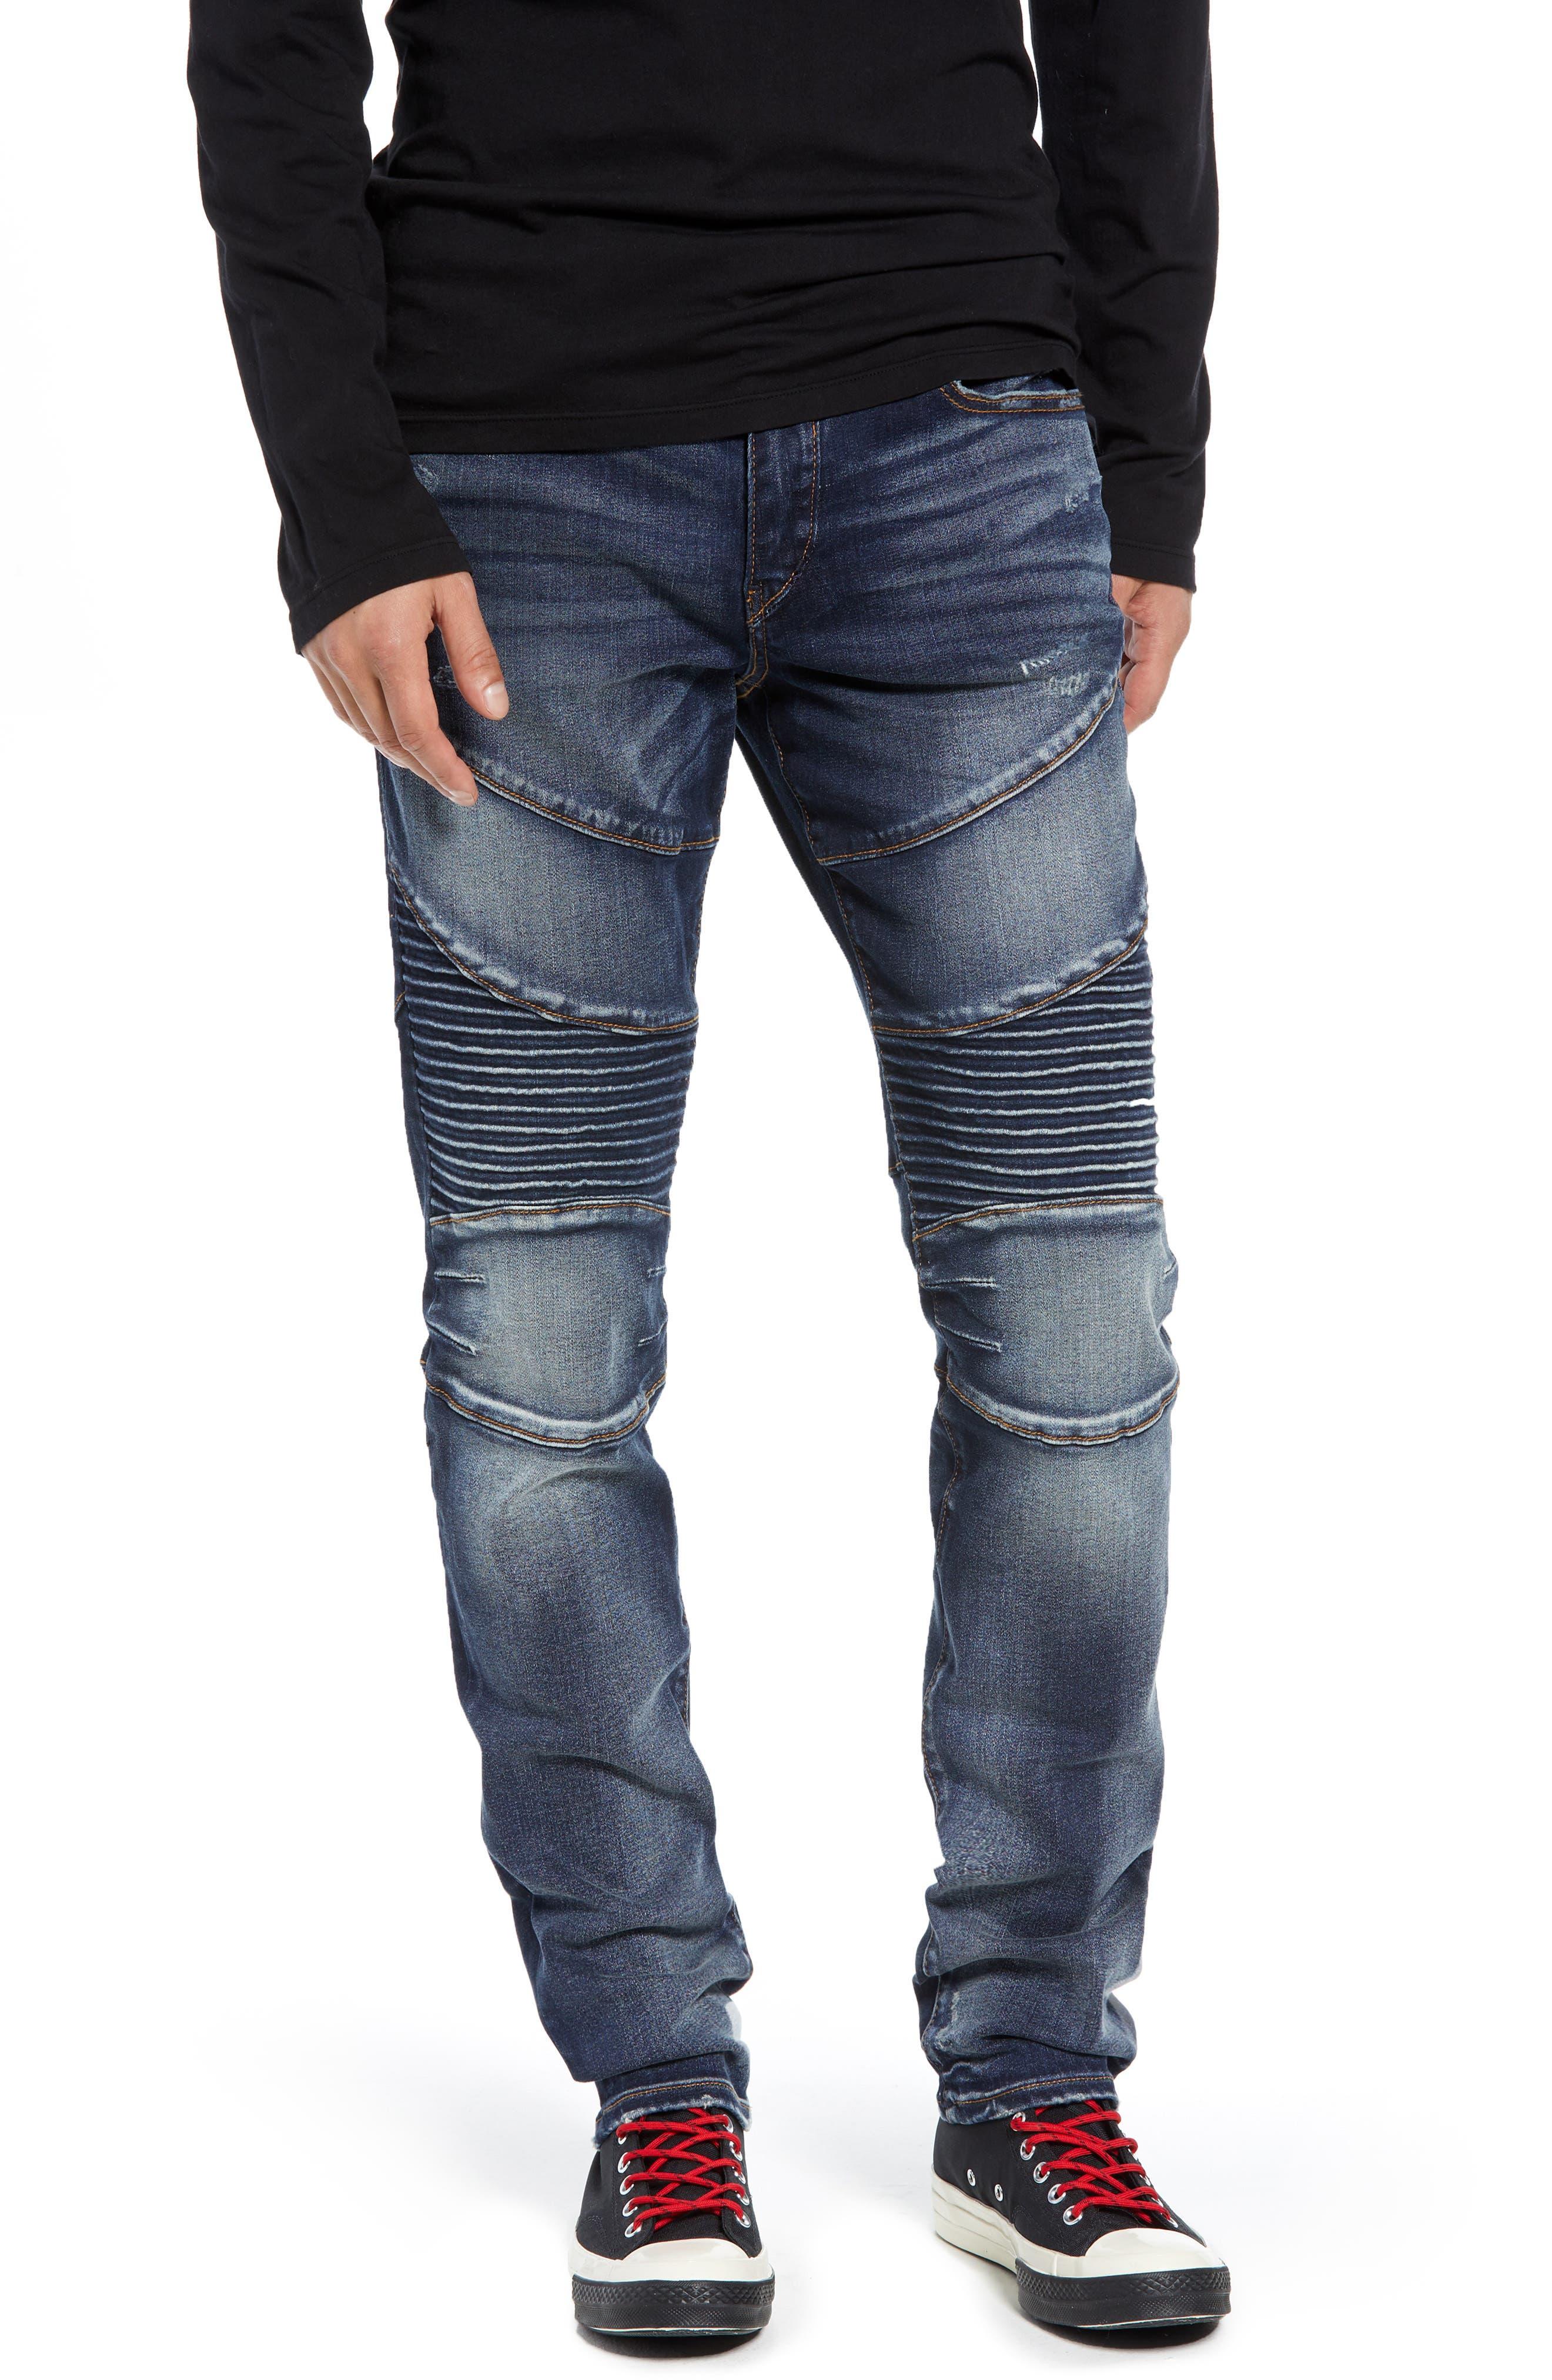 Rocco Skinny Fit Moto Jeans,                         Main,                         color, MINERAL ASPHALT